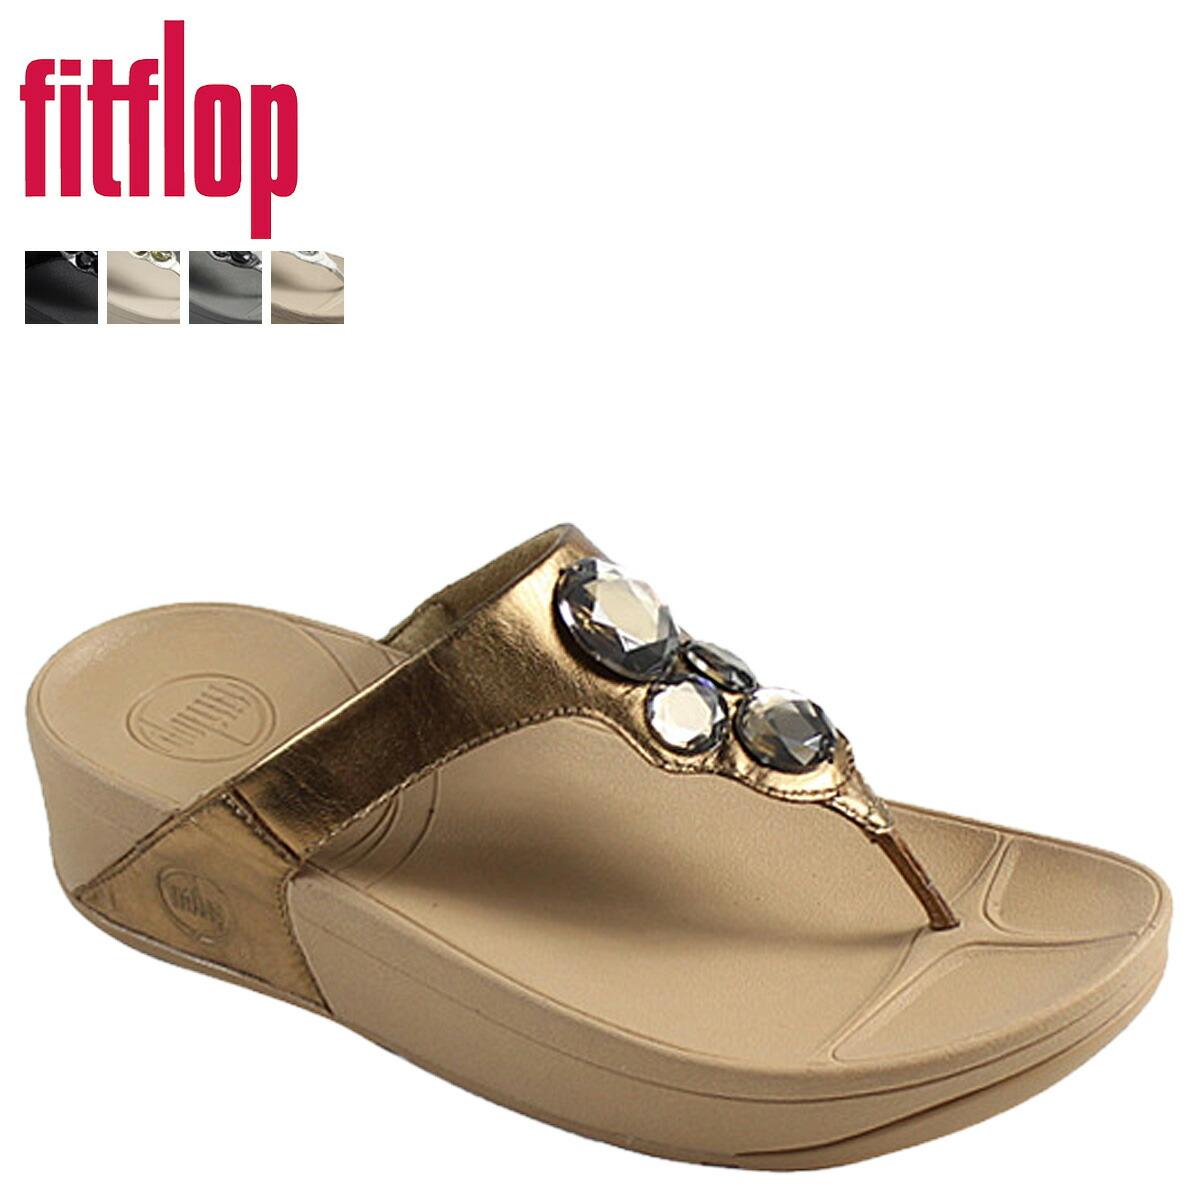 fitflop lunetta sandals